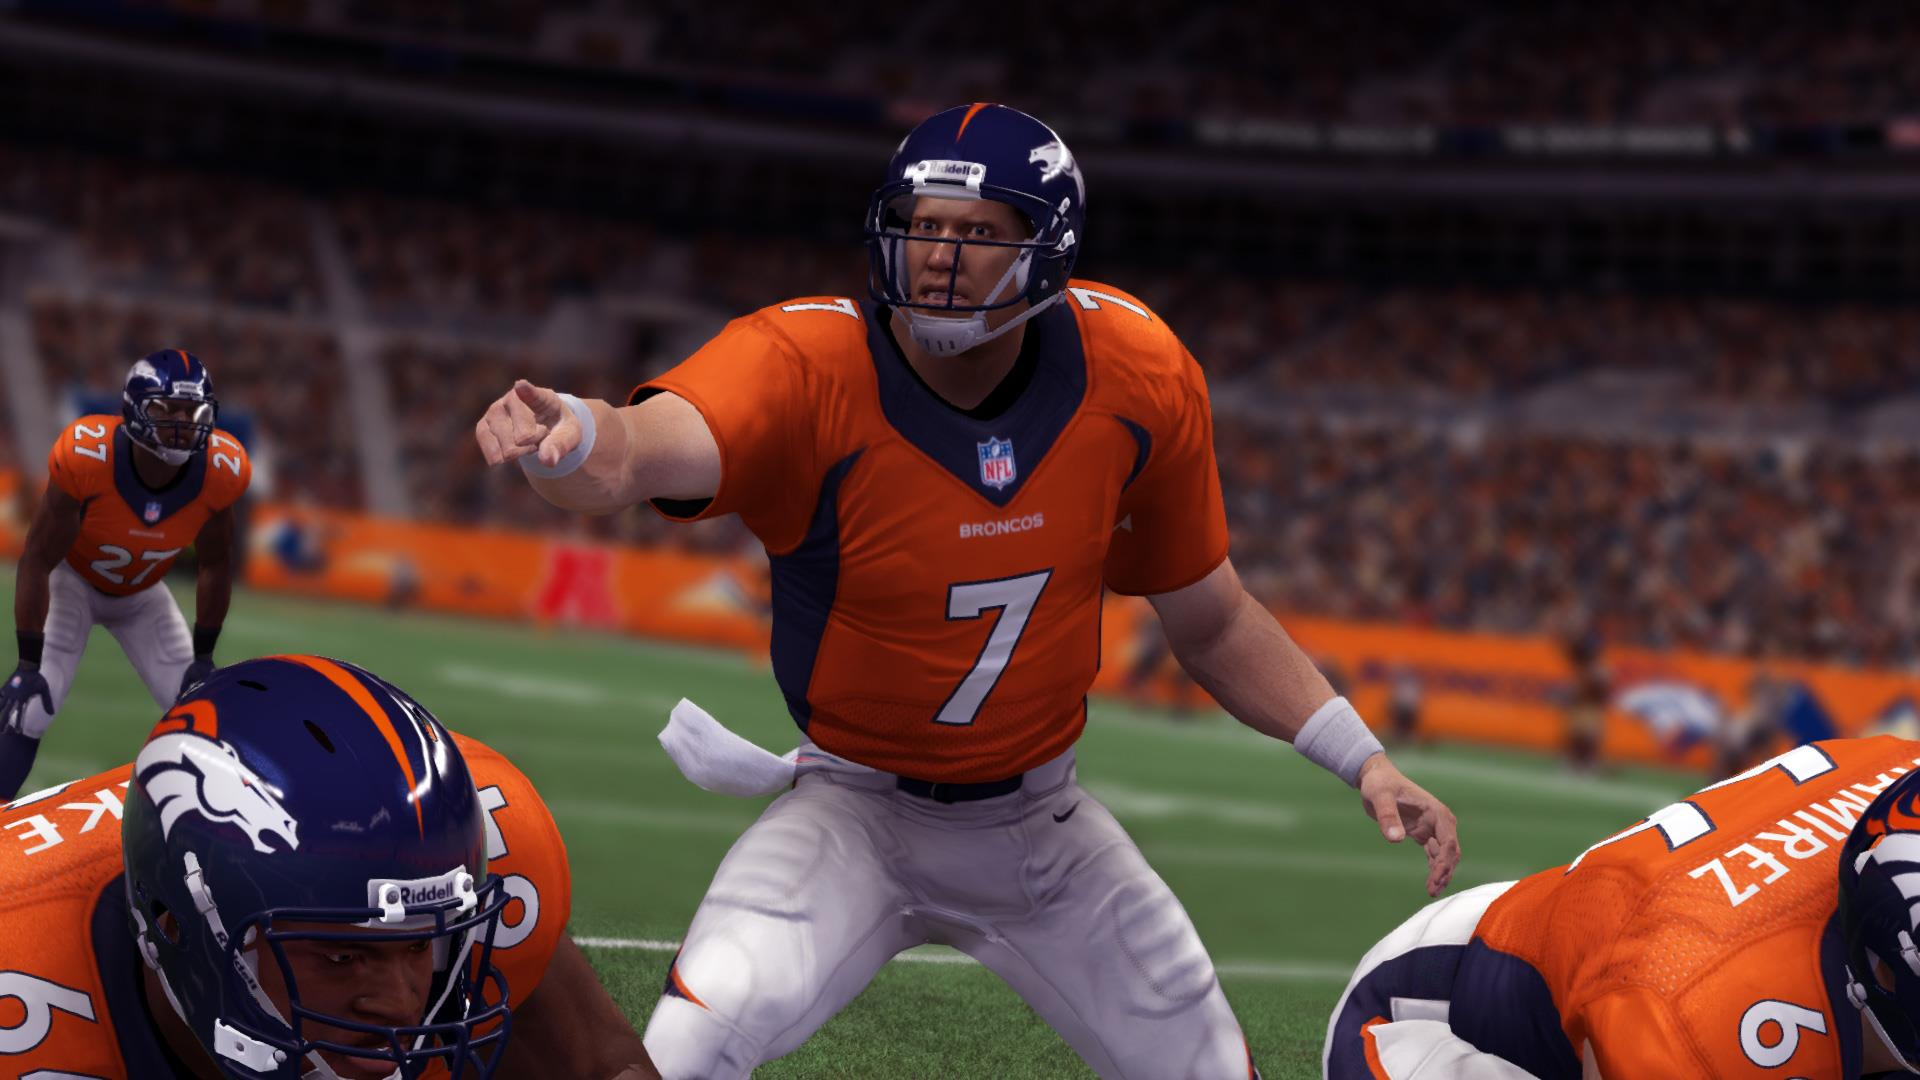 John Elway Legacy Award in Madden NFL 25 (Xbox One)